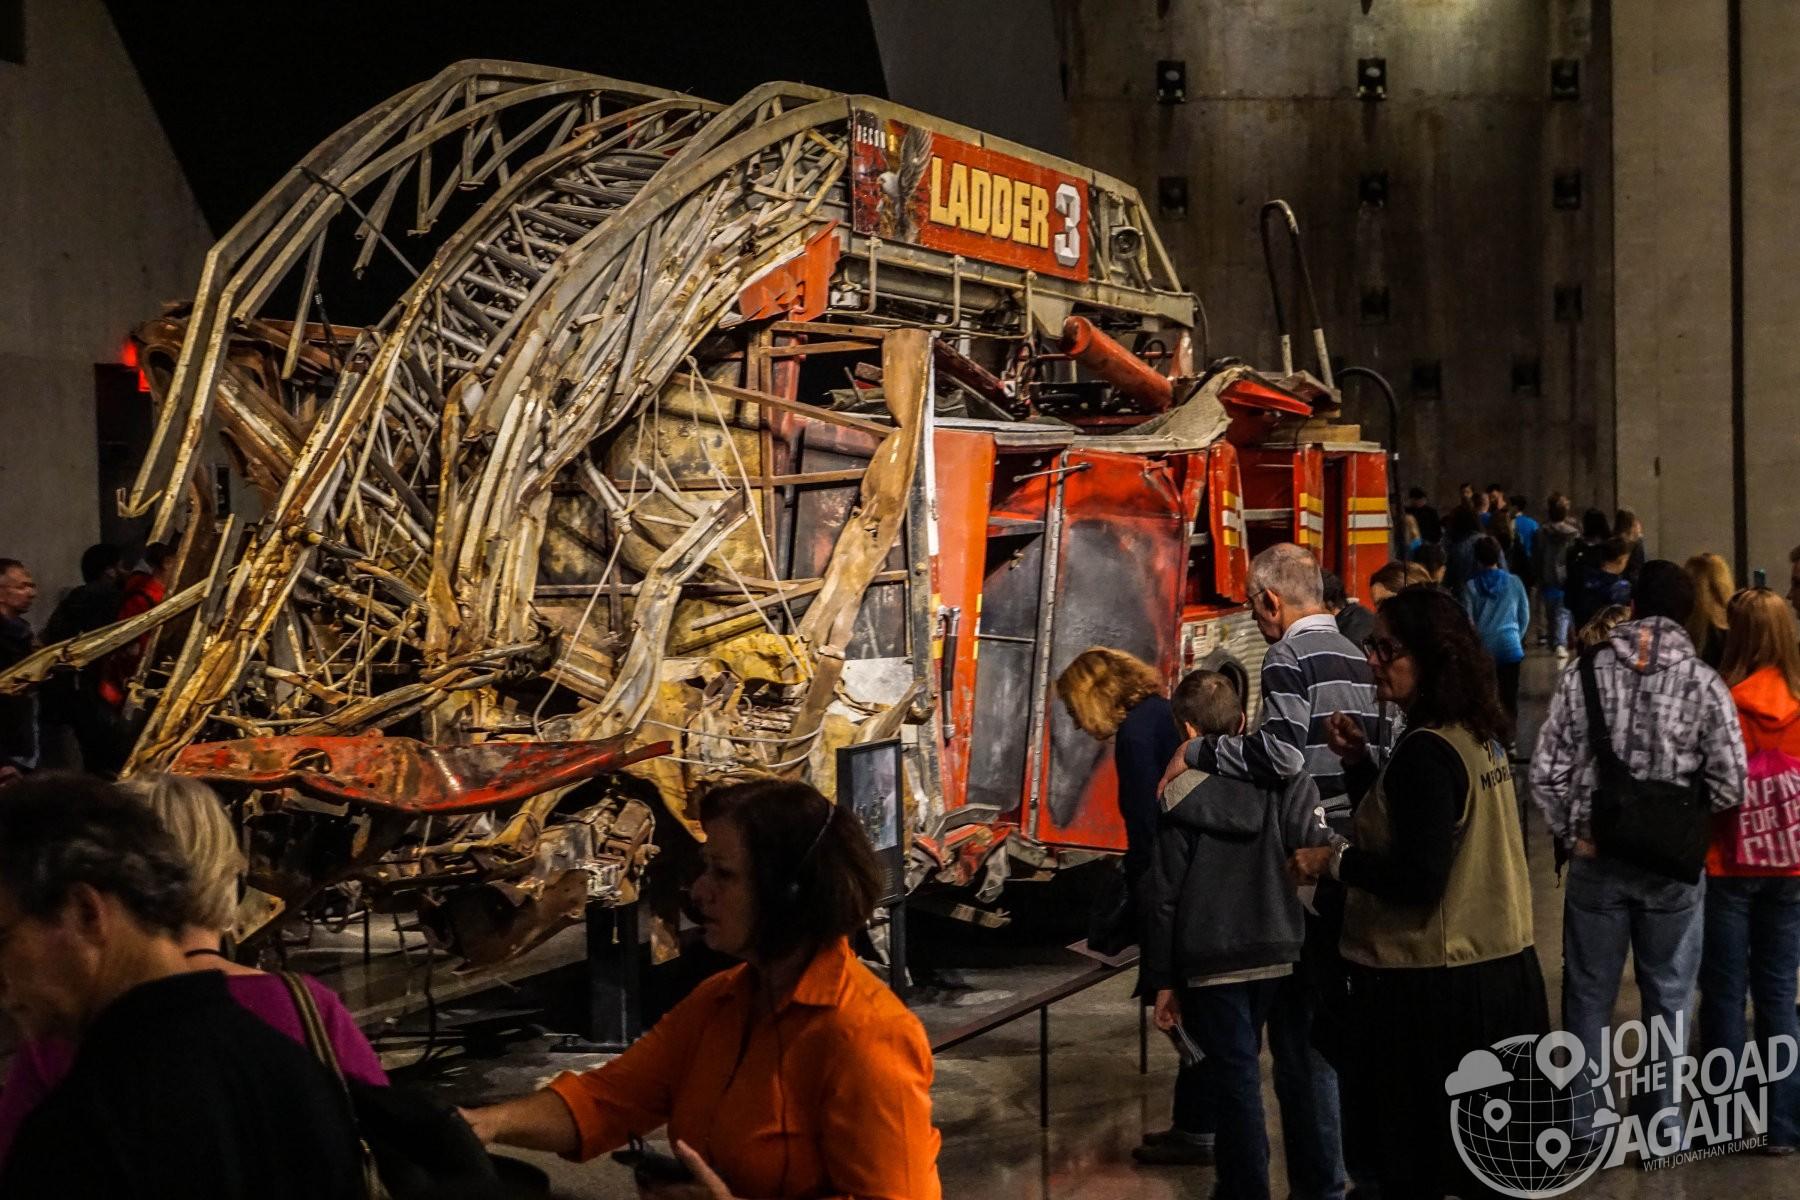 September 11th wrecked fire truck